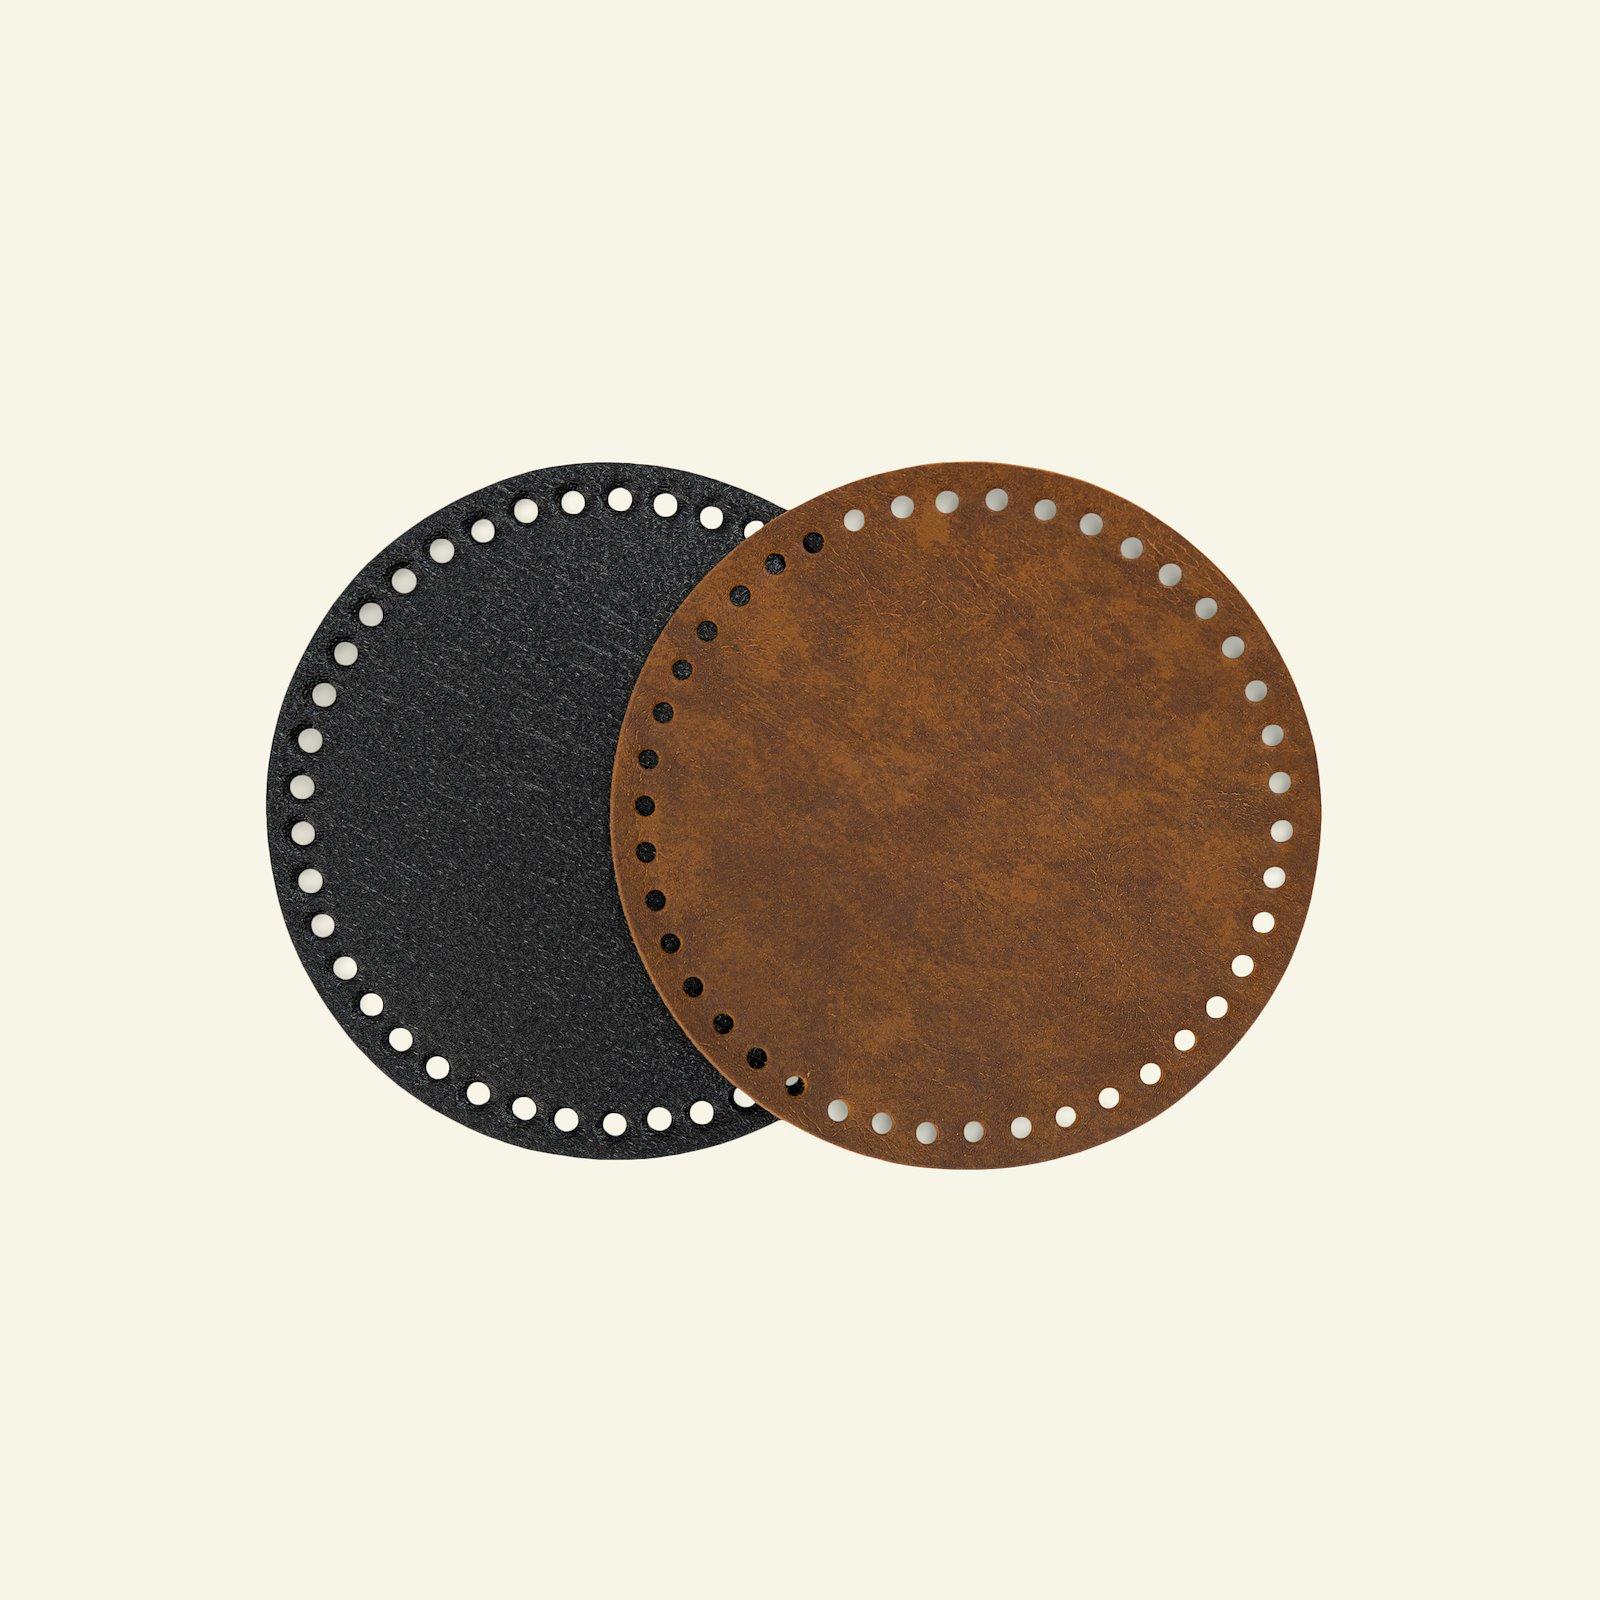 FRAYA bag/basket bottom 16cm brown 1pc 83308_pack